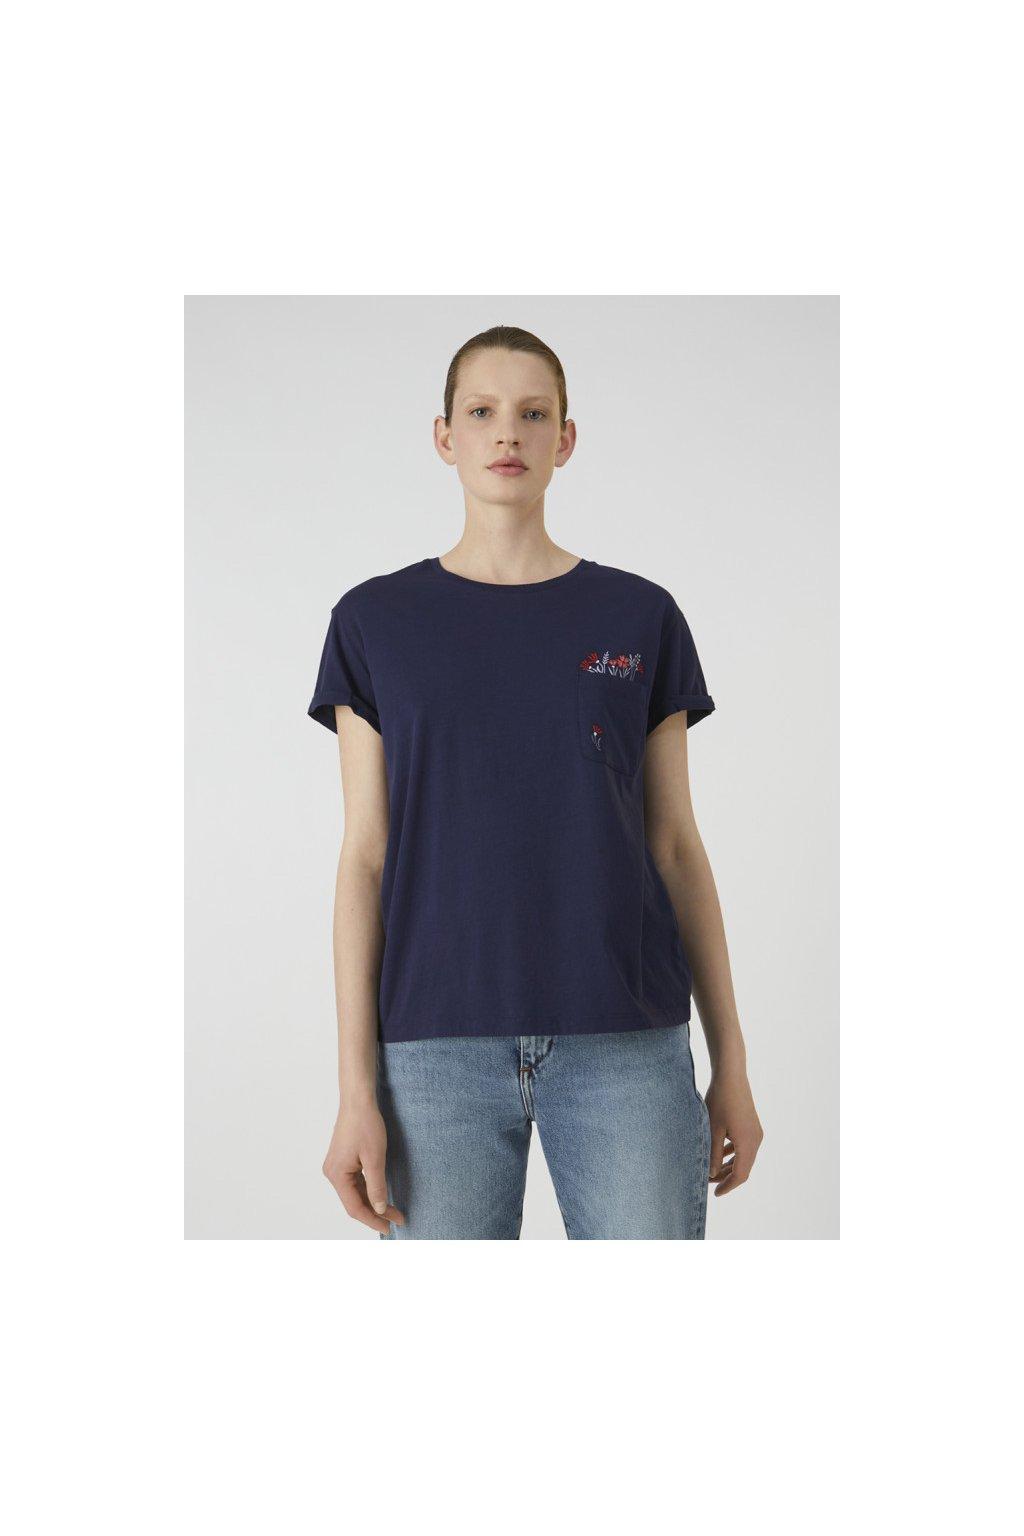 "Dámské modré tričko z biobavlny ""NAALIN POCKET FULL OF FLOWERS"" (Velikost L)"